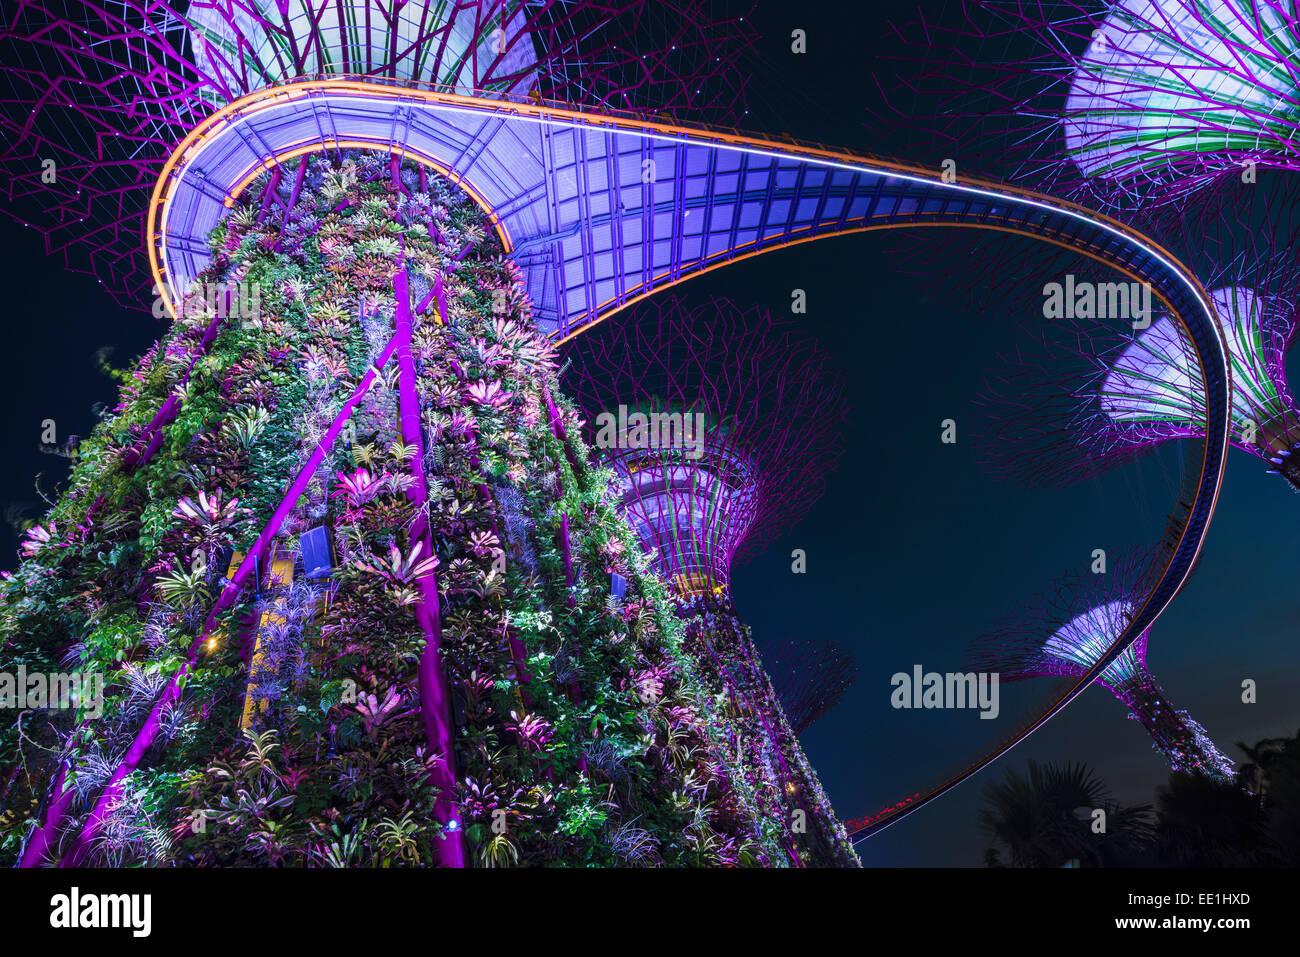 Jardines junto a la bahía de noche, Singapur, Sudeste de Asia, Asia Imagen De Stock